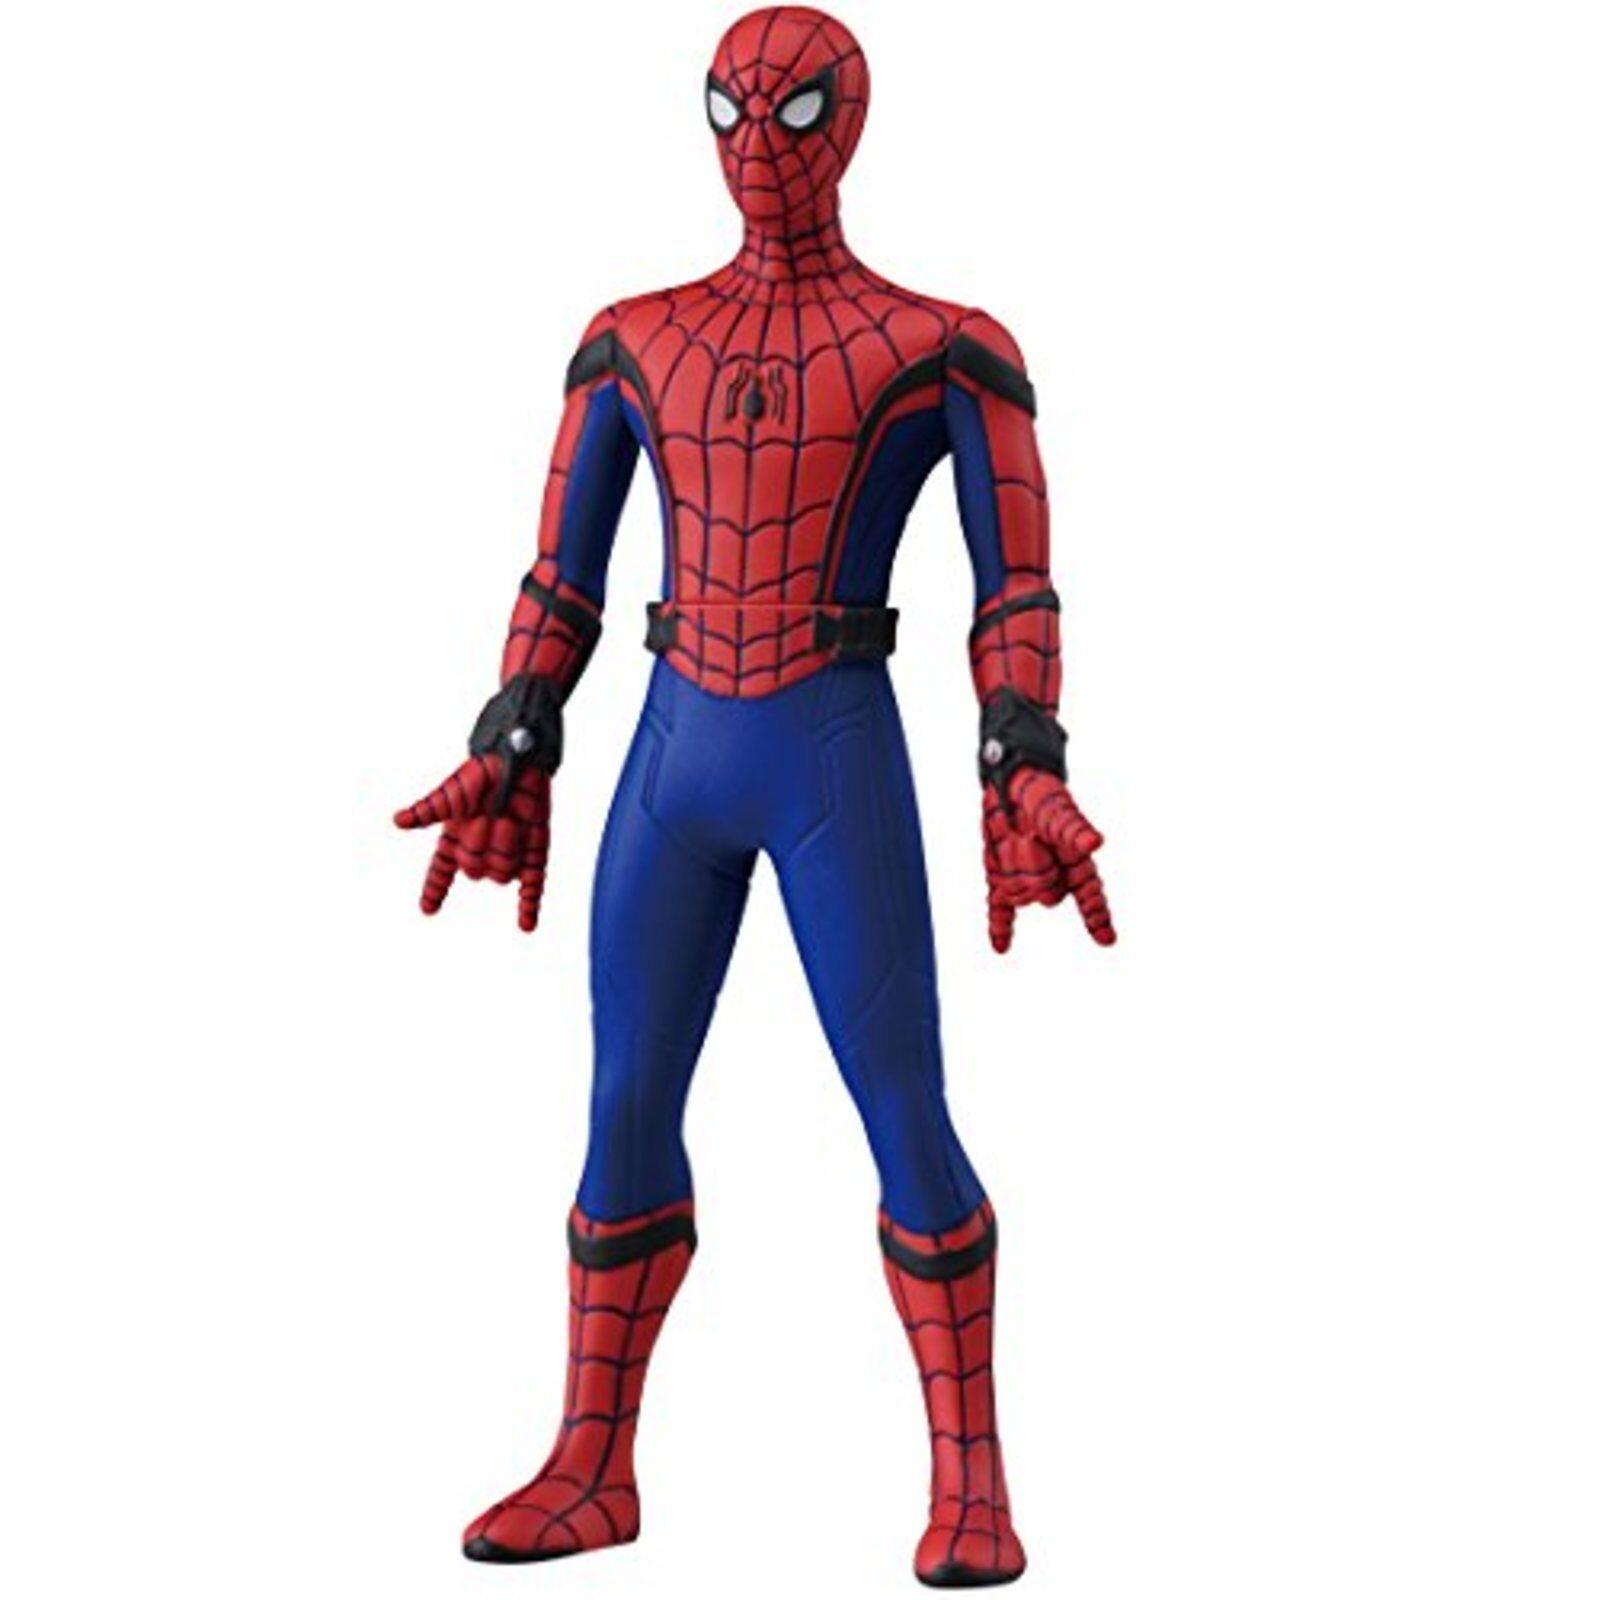 Figurine  en Métal Collection Marvel Spider-Man Homecoming Ver. 78mm F S W   2018 dernier